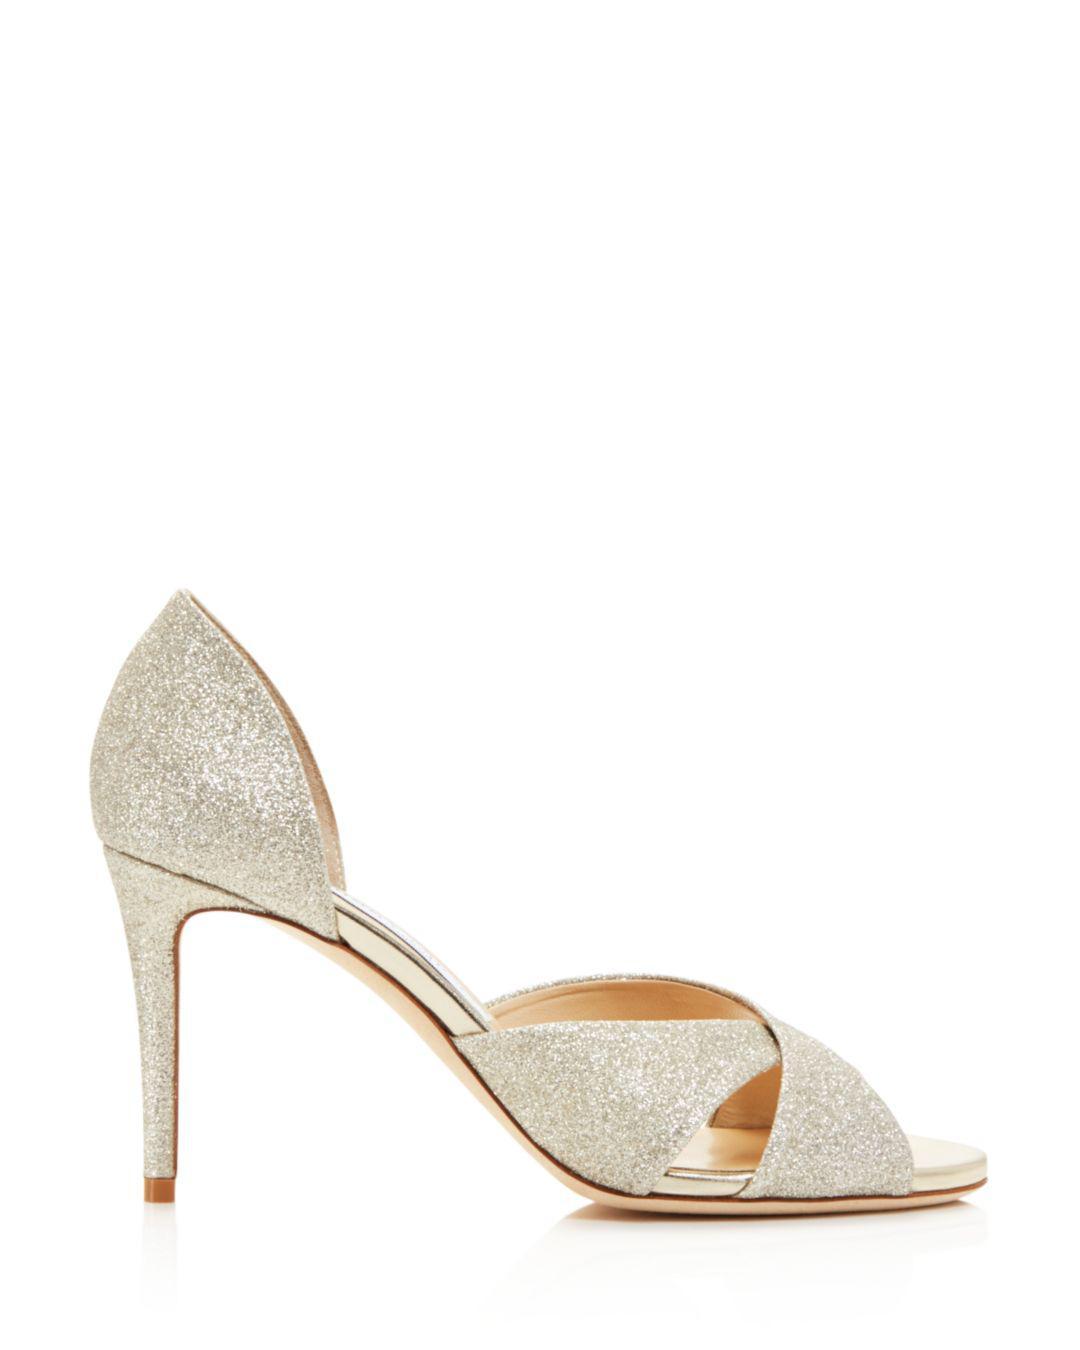 6afd0ed9be8 Lyst - Jimmy Choo Women s Lara 85 Glitter D orsay High-heel Sandals in  Metallic